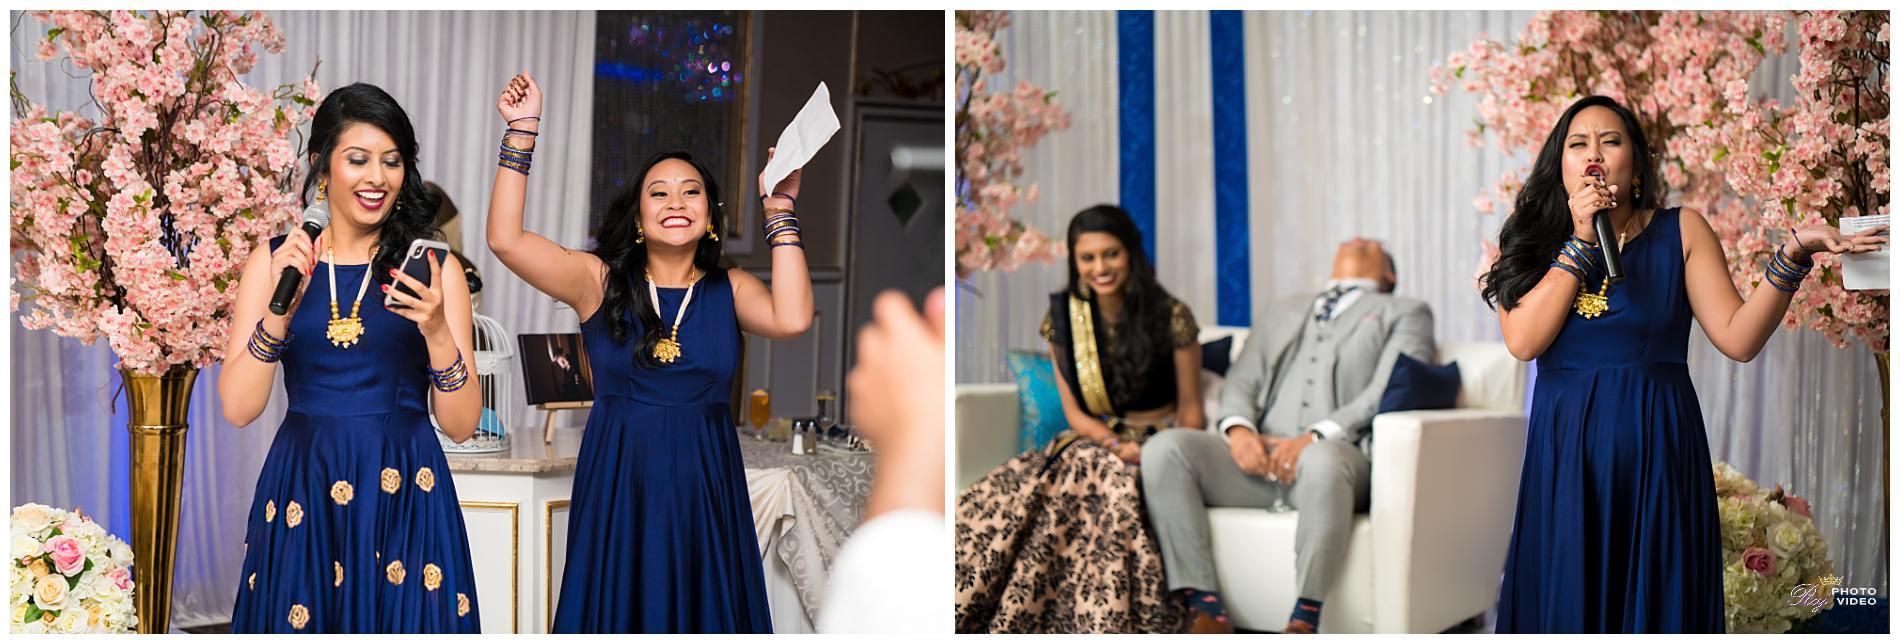 Royal-Manor-Garfield-NJ-Christian-Wedding-Ceremony-Khusbu-Jeff-72.jpg